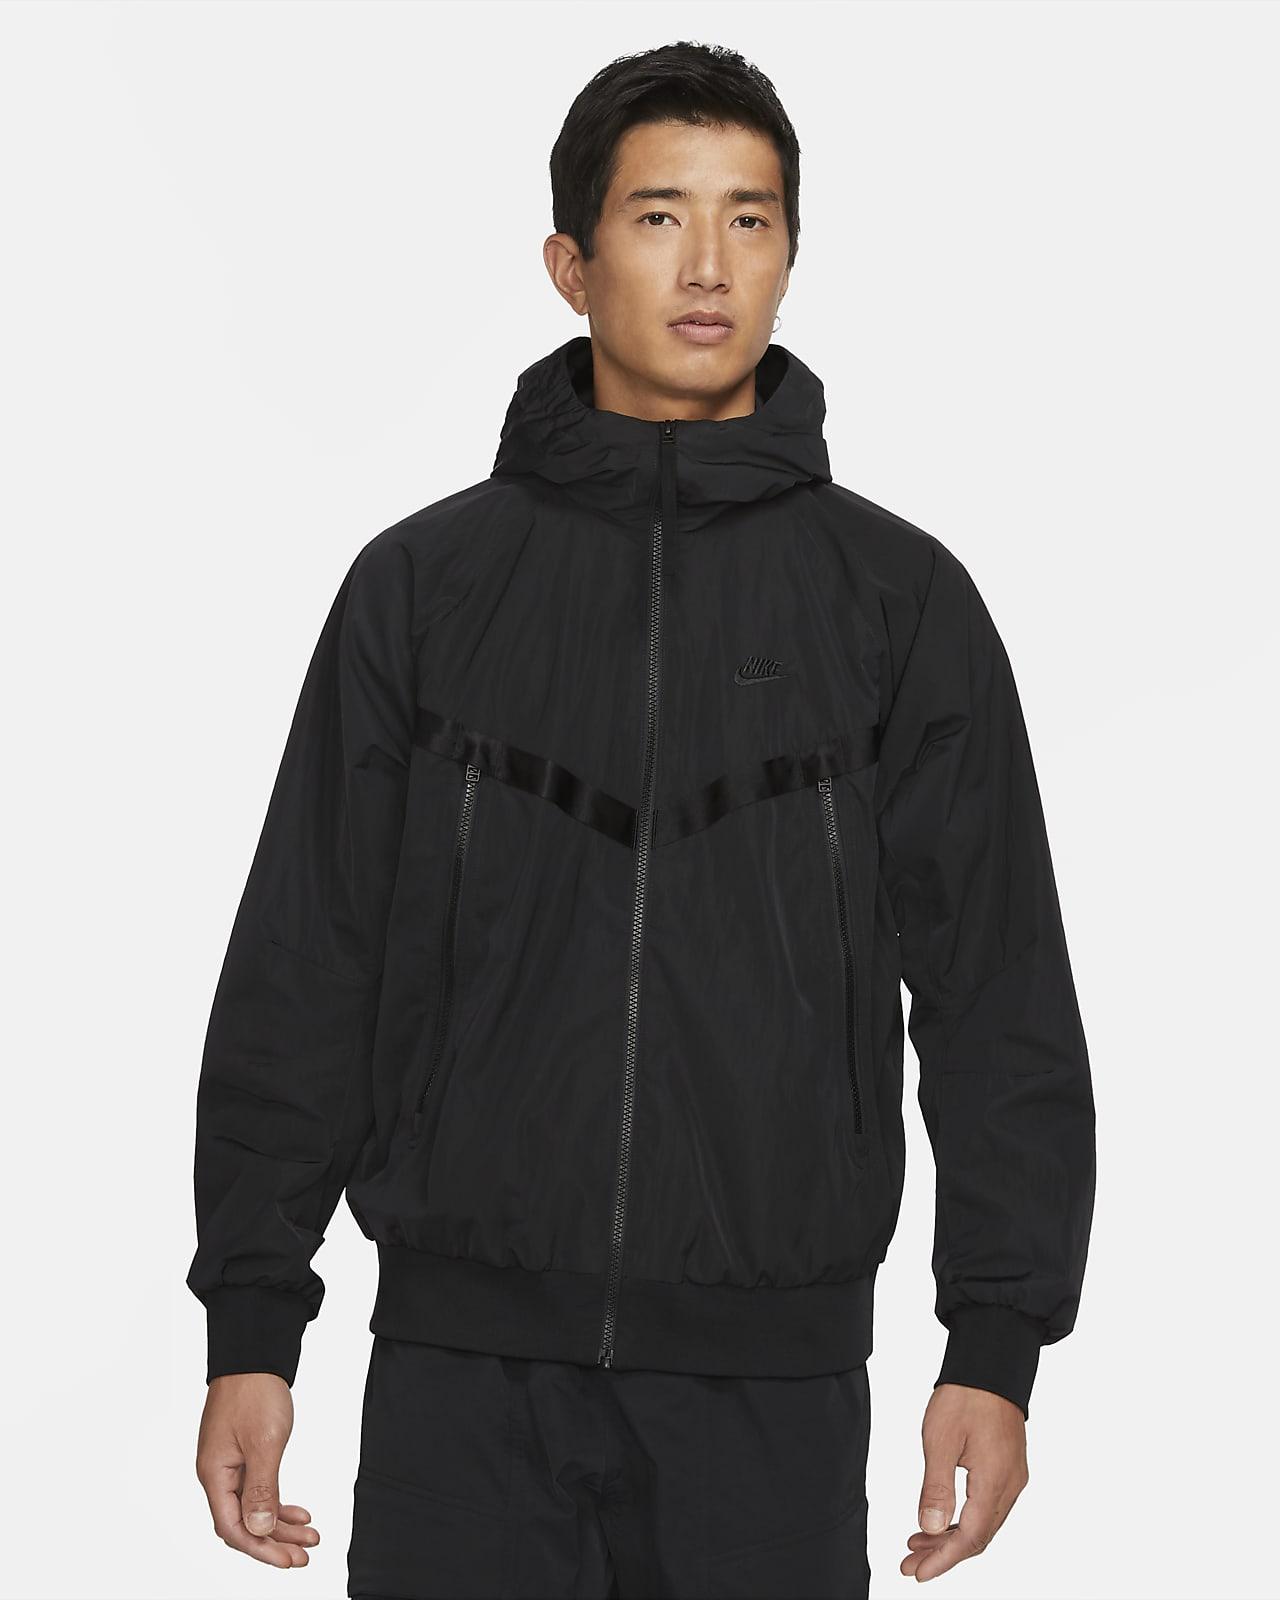 Nike Sportswear Premium Essentials Men's Unlined Hooded Windrunner Jacket